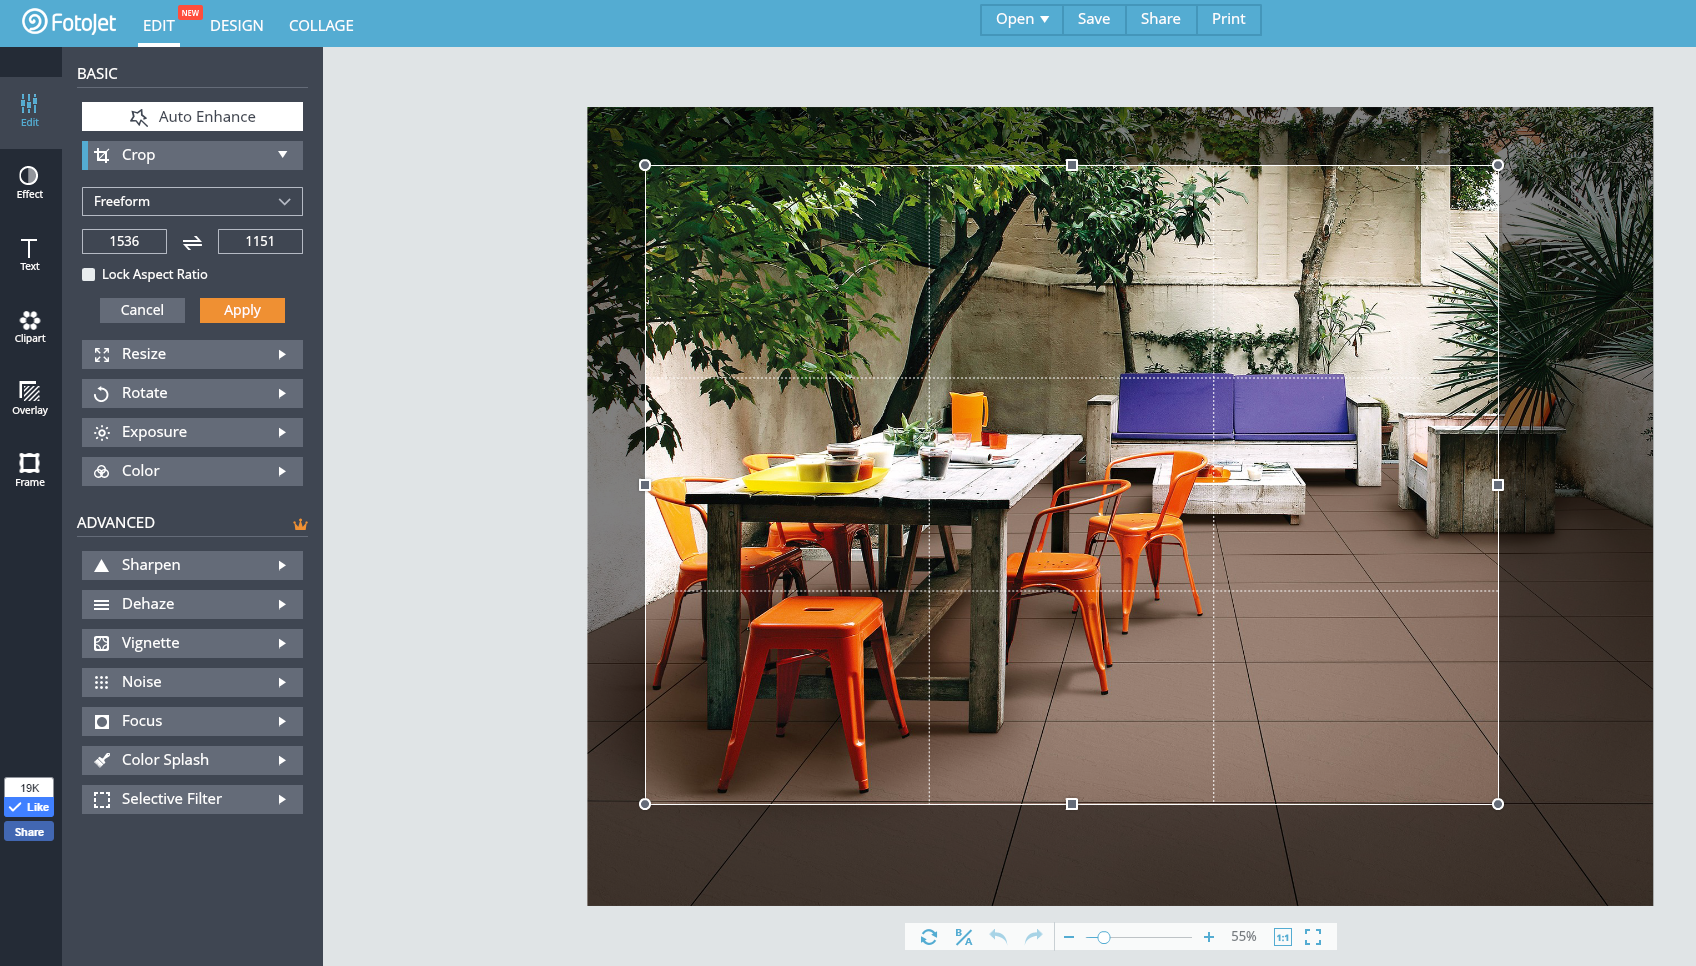 Fotojet designer cliparts india jpg freeuse stock FotoJet\'s Photo Editor Makes Online Photo Editing Easy - Start-Up ... jpg freeuse stock